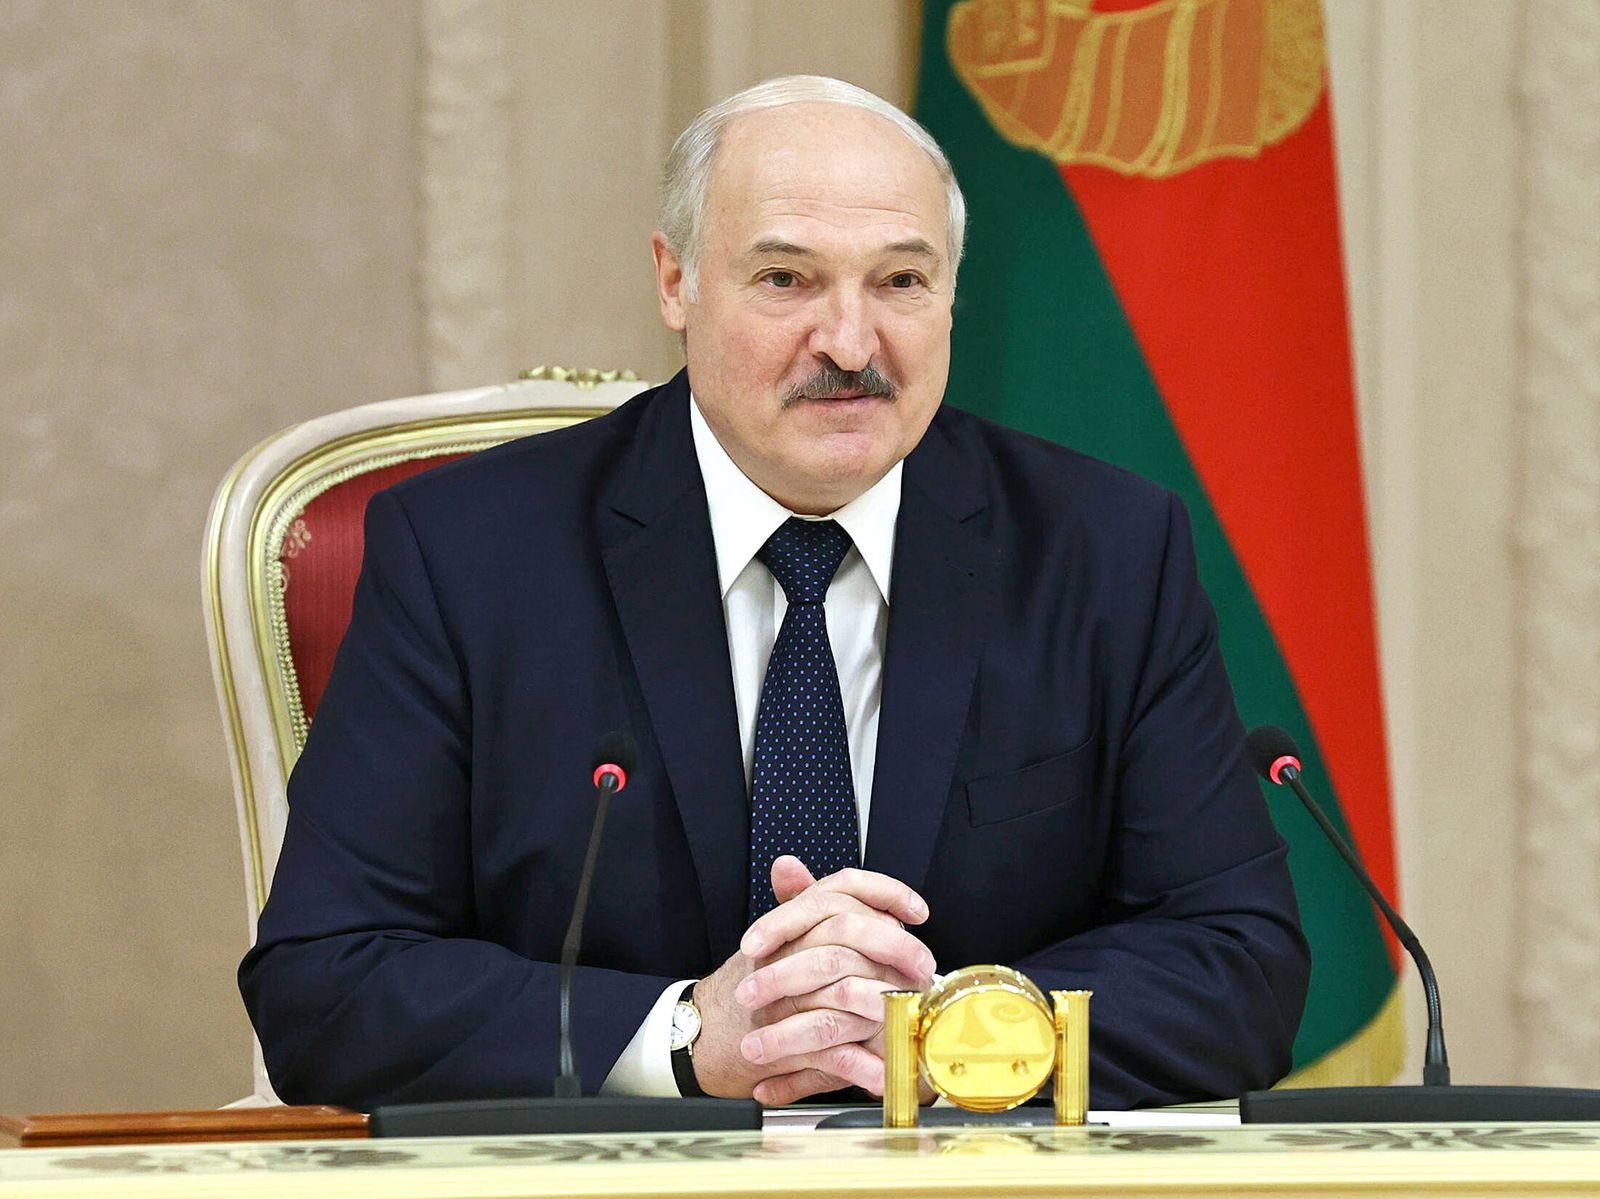 MINSK, BELARUS - SEPTEMBER 28, 2020: Belarus President Alexander Lukashenko during a meeting with Russia s Pskov Region